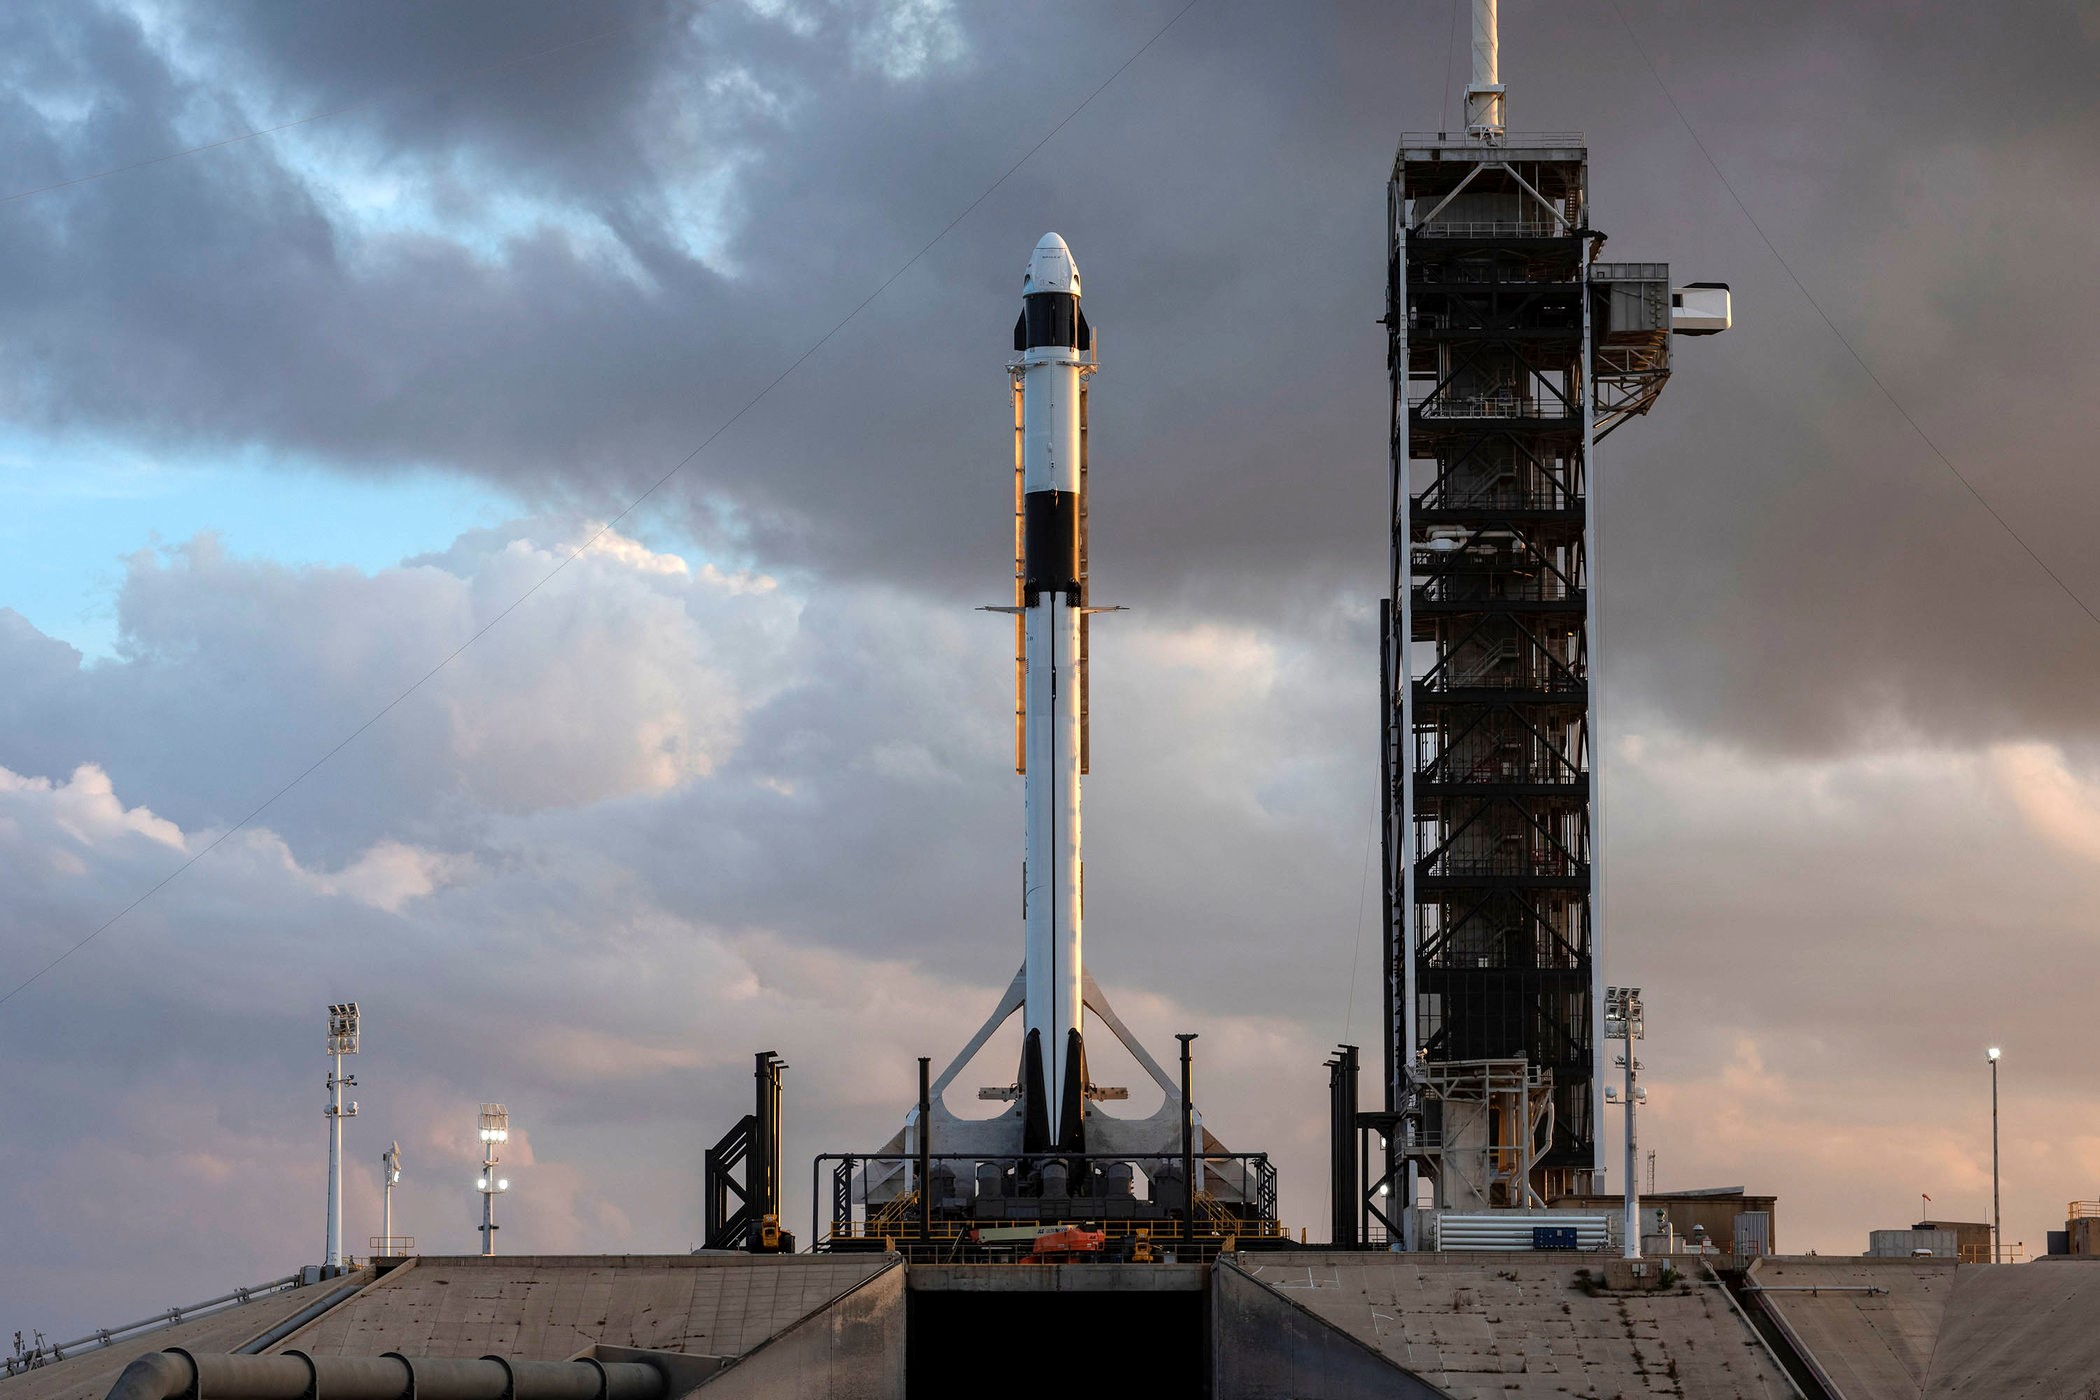 SpaceX载人飞船首次测试飞行再推迟,不早于2月份